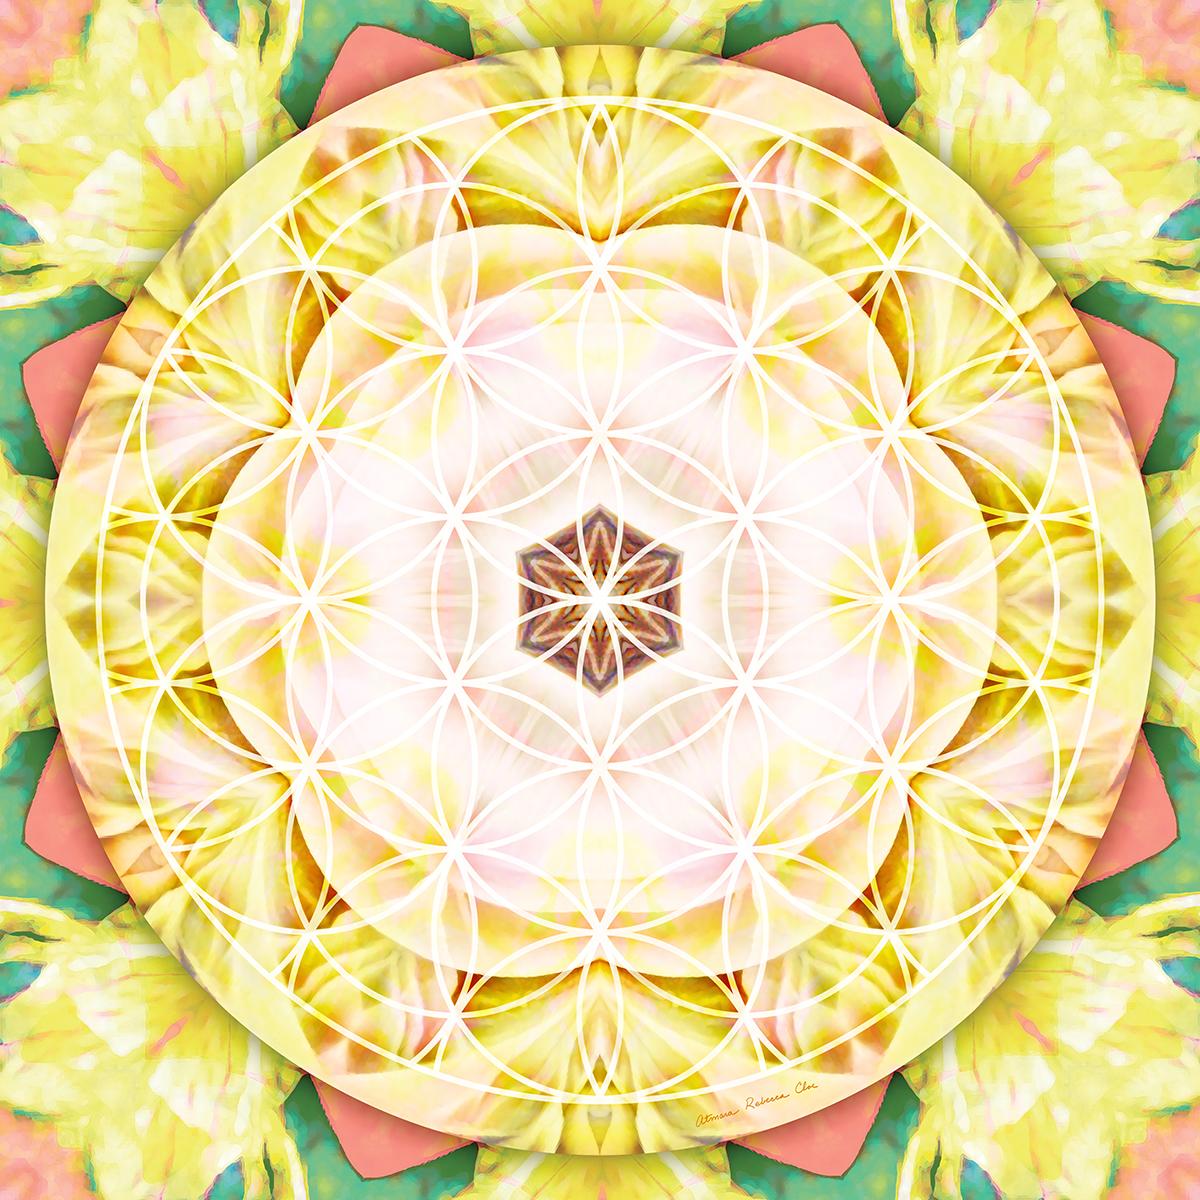 The Visionary Mandalas of Atmara Rebecca Cloe